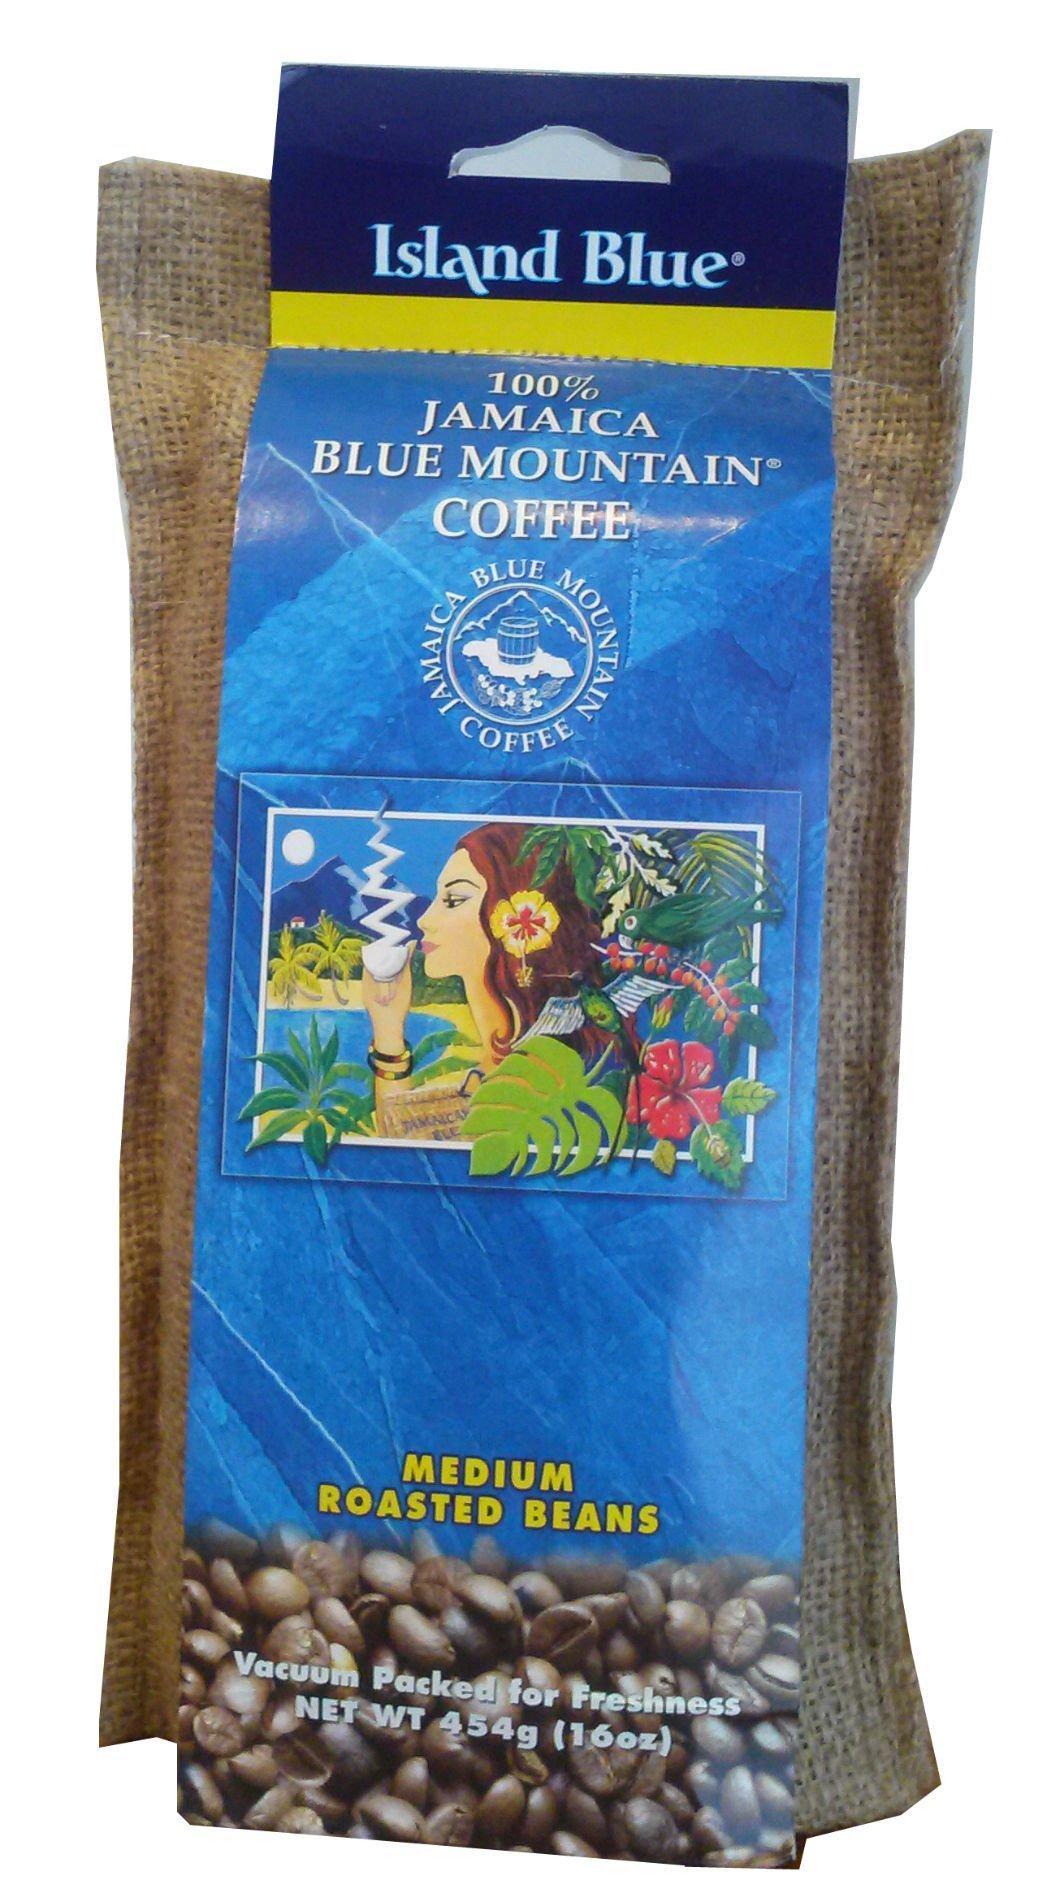 Island Blue 100% Jamaica Blue Mountain Whole Beans Coffee (16oz) by Blue island